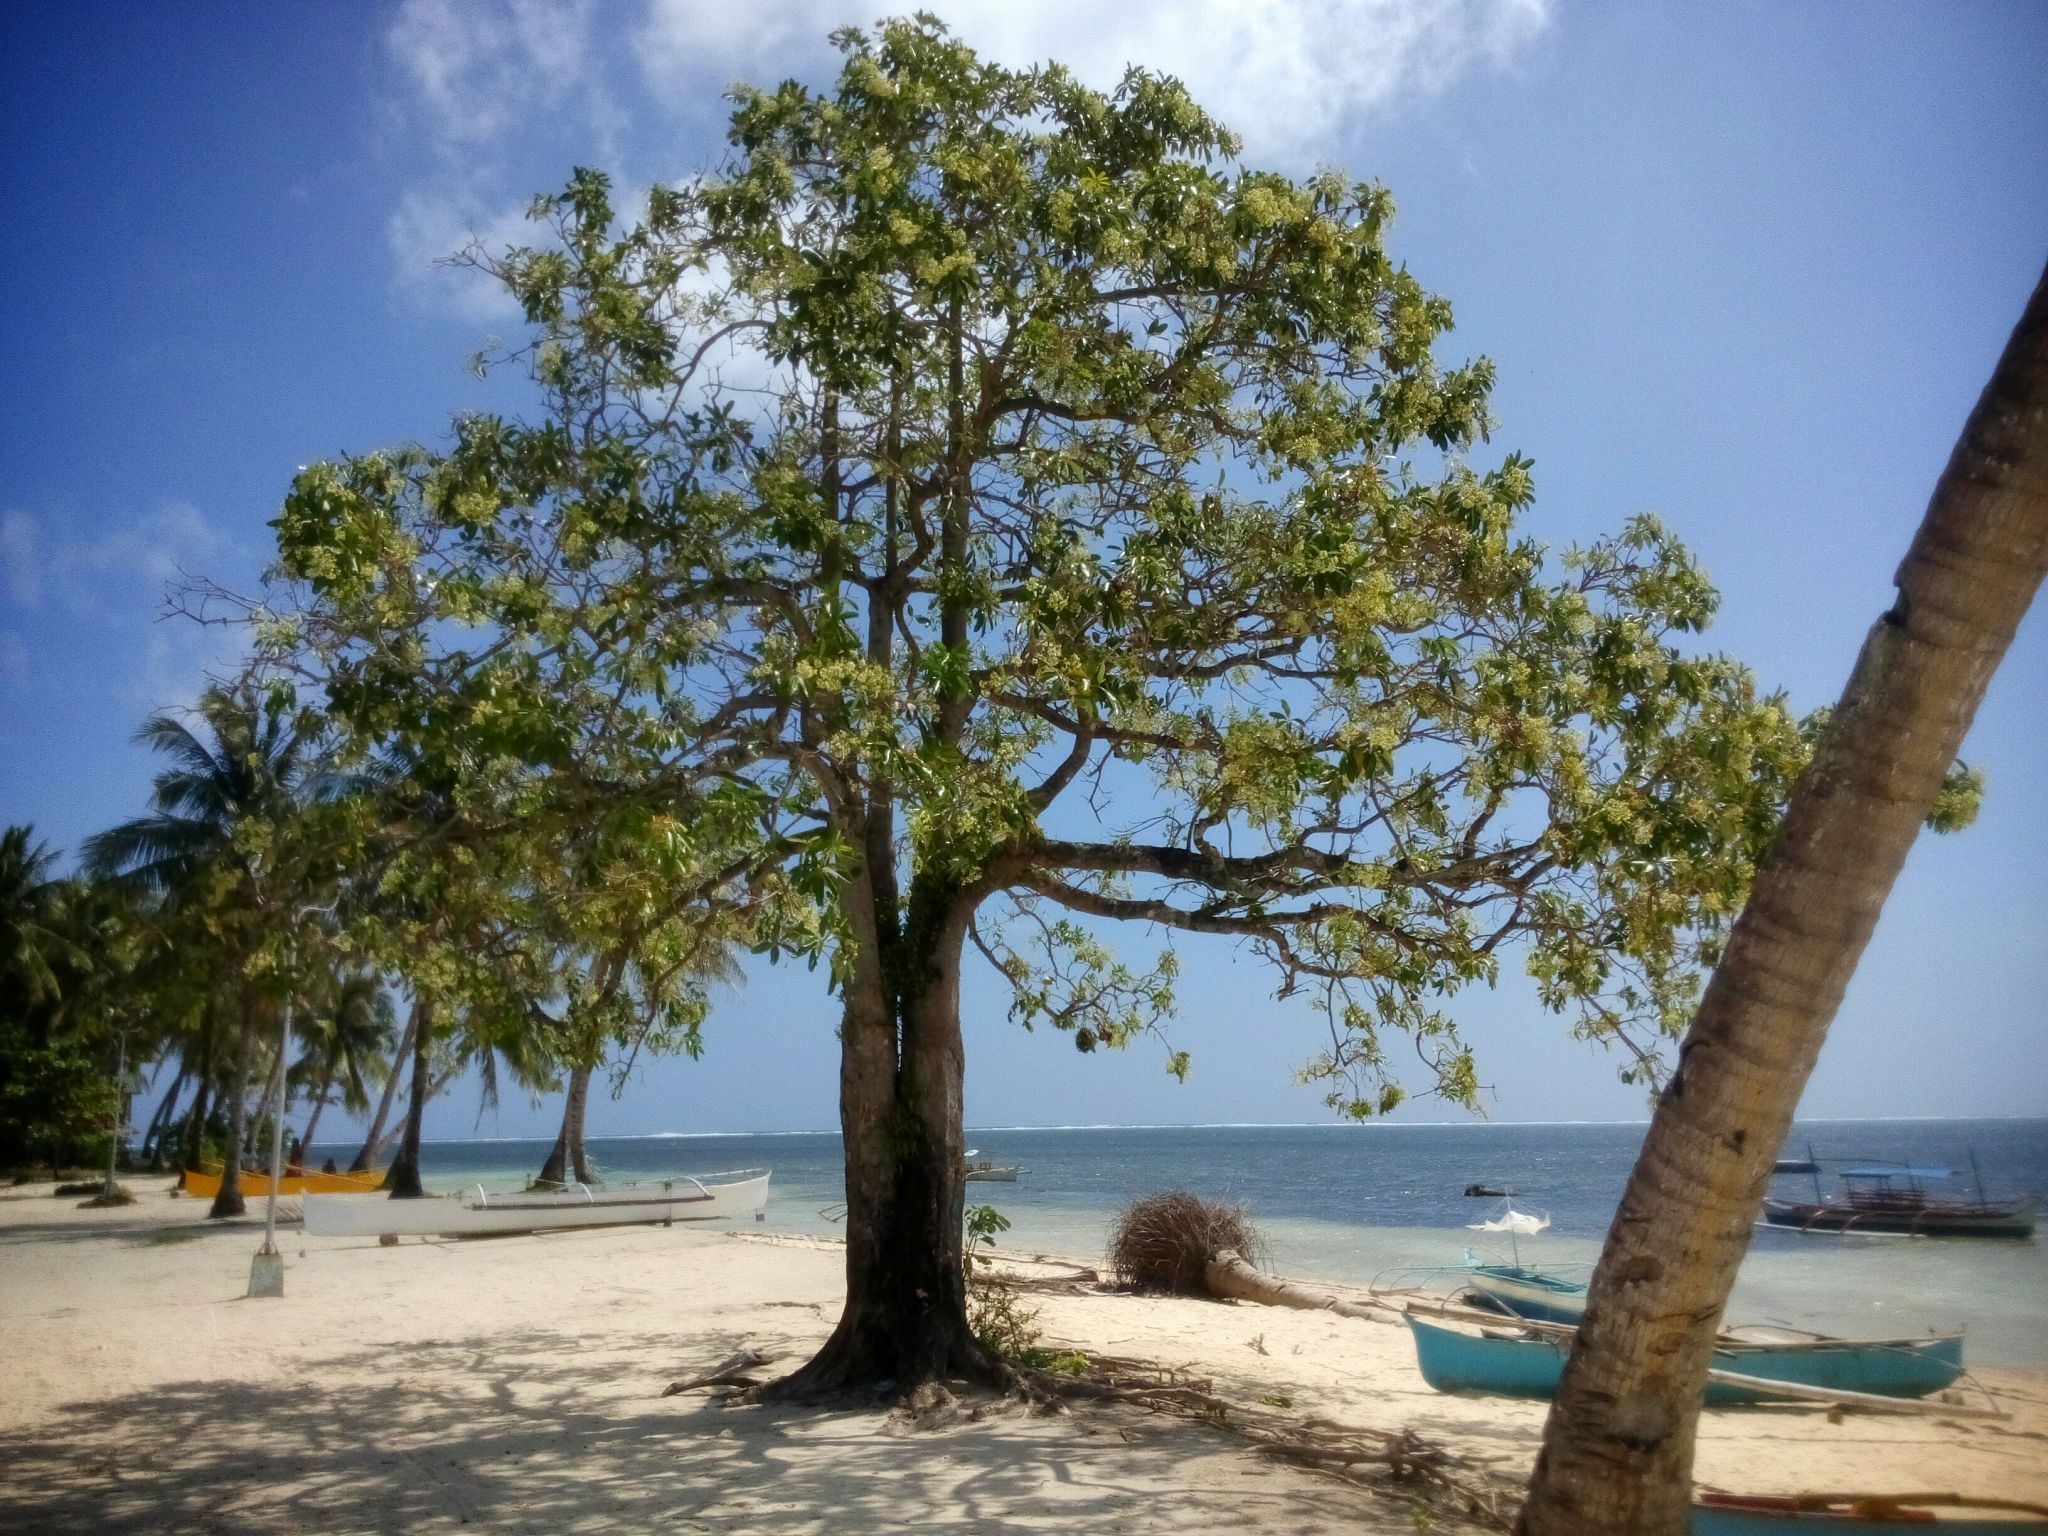 Plaża w General Luna na wyspie Siargao na Filipinach